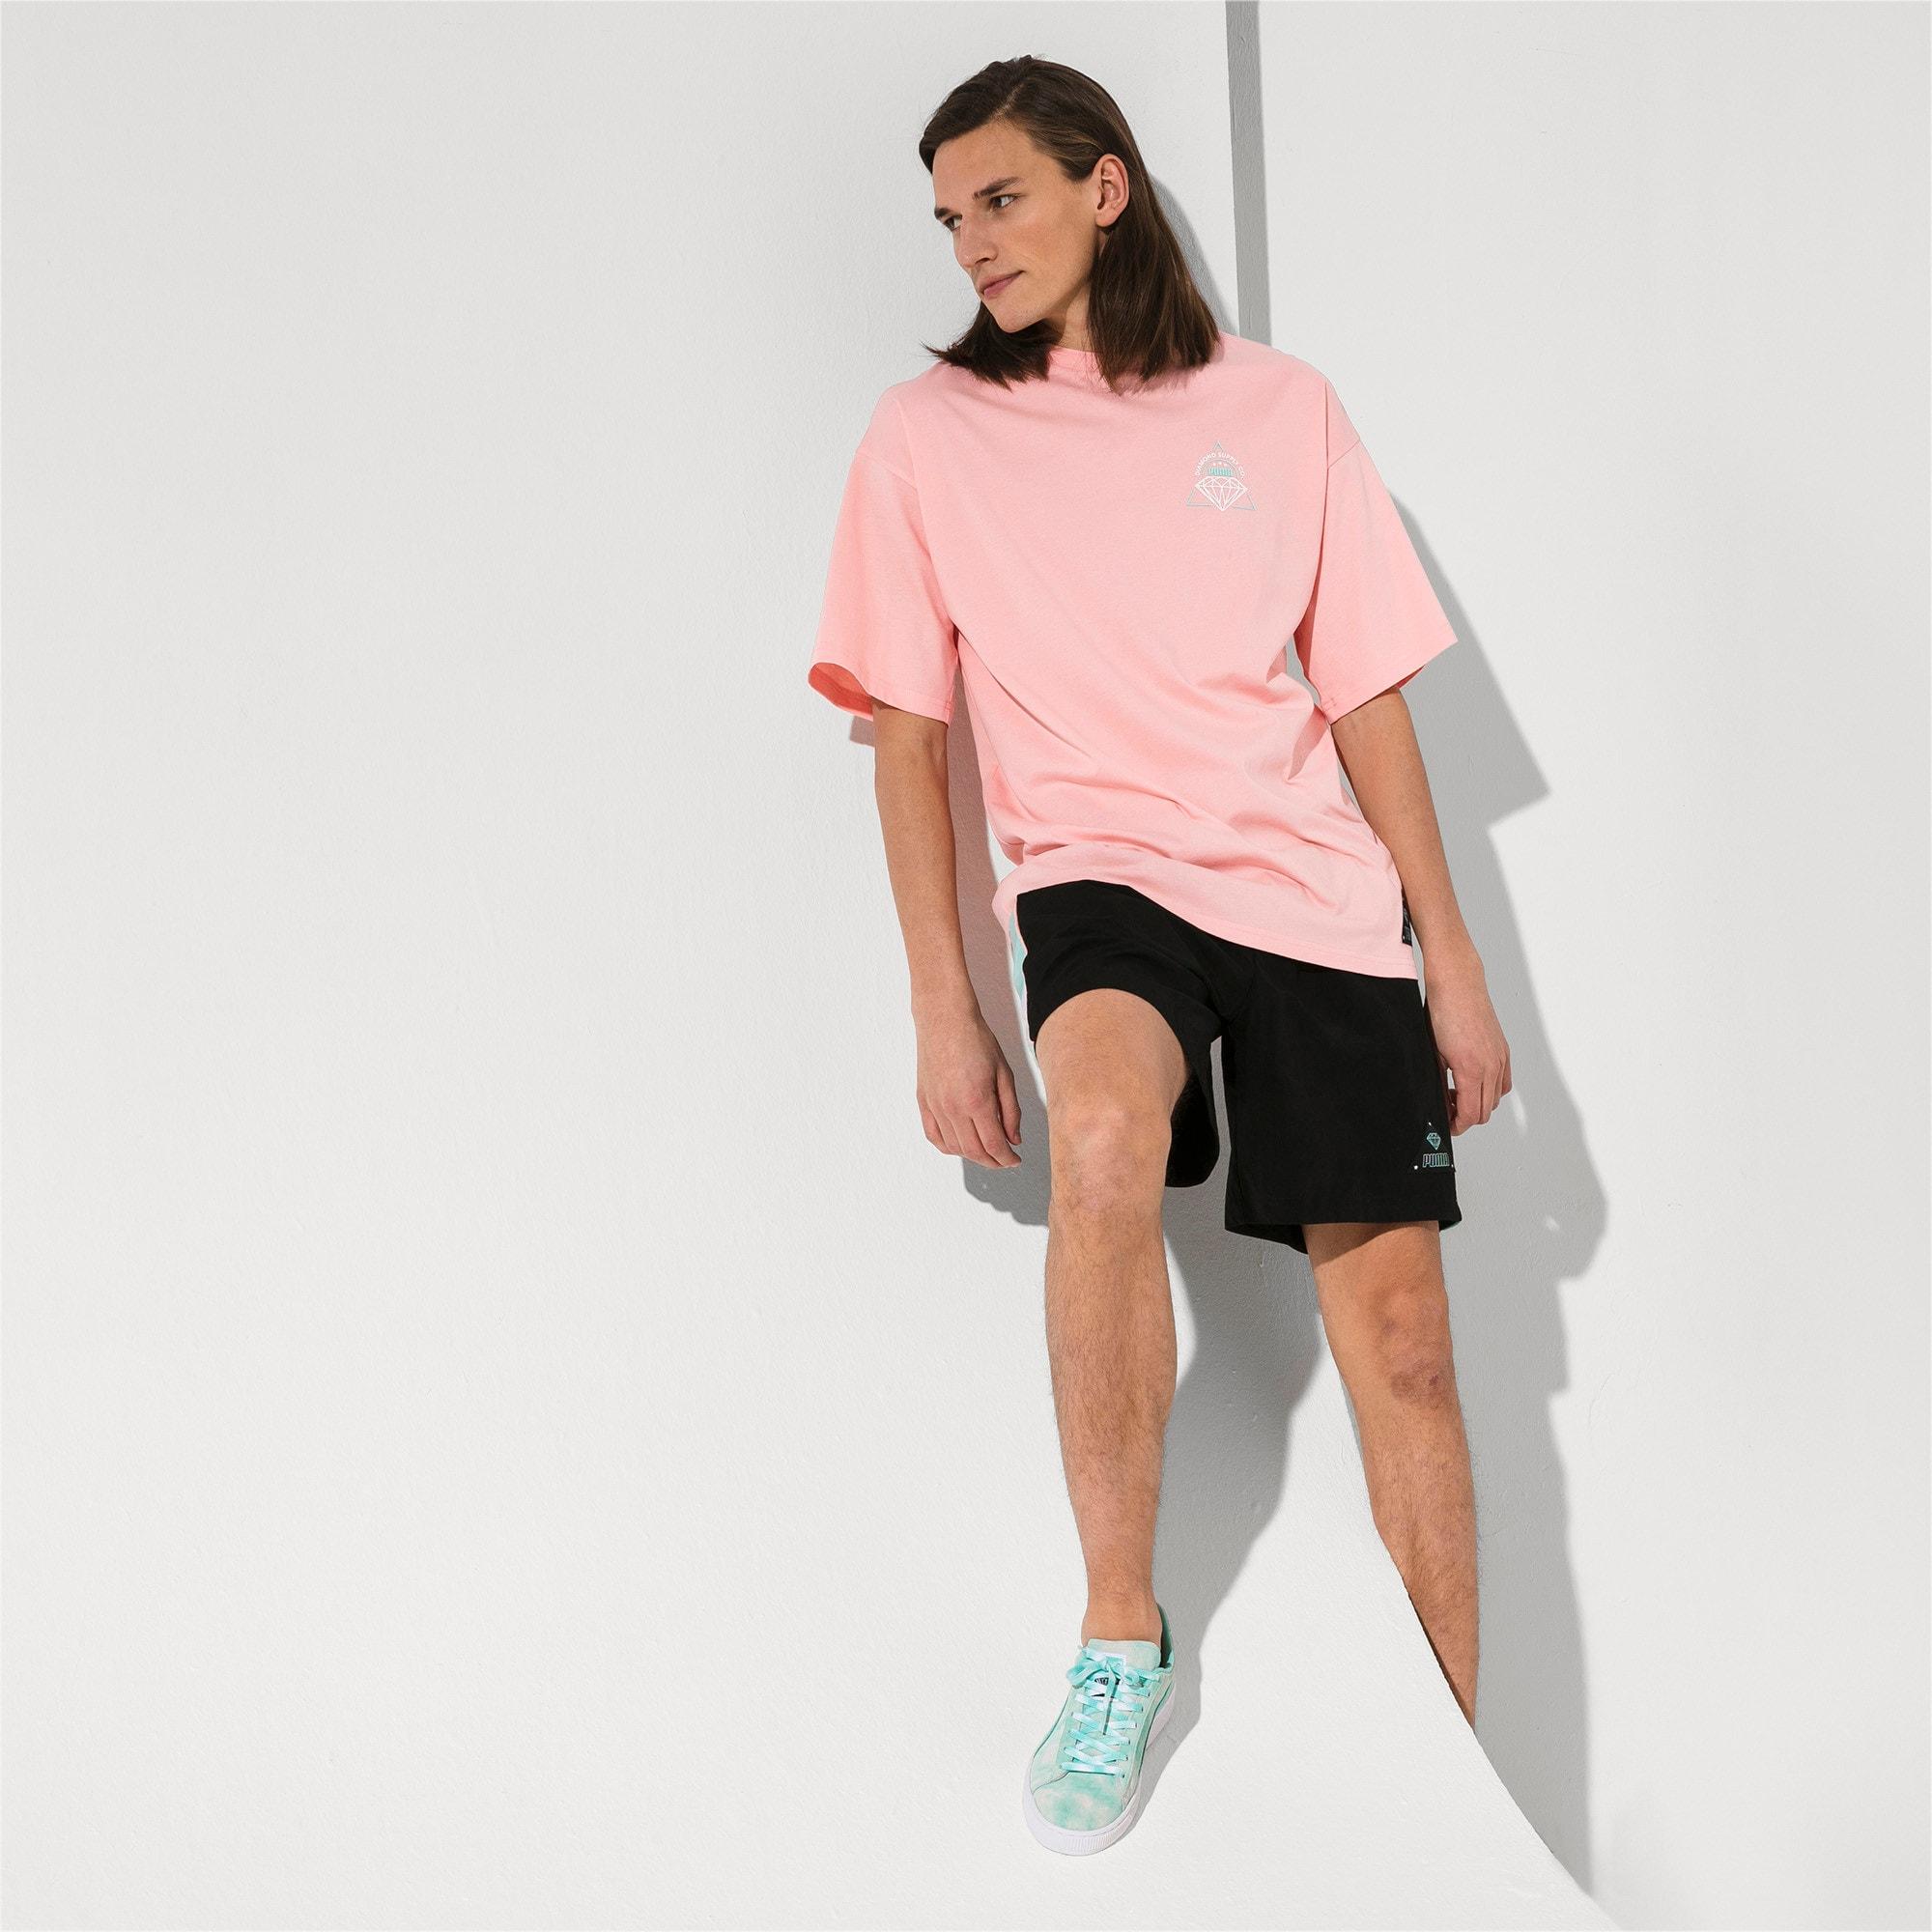 Thumbnail 5 of PUMA x DIAMOND T-shirt met korte mouwen voor heren, Peach Bud, medium